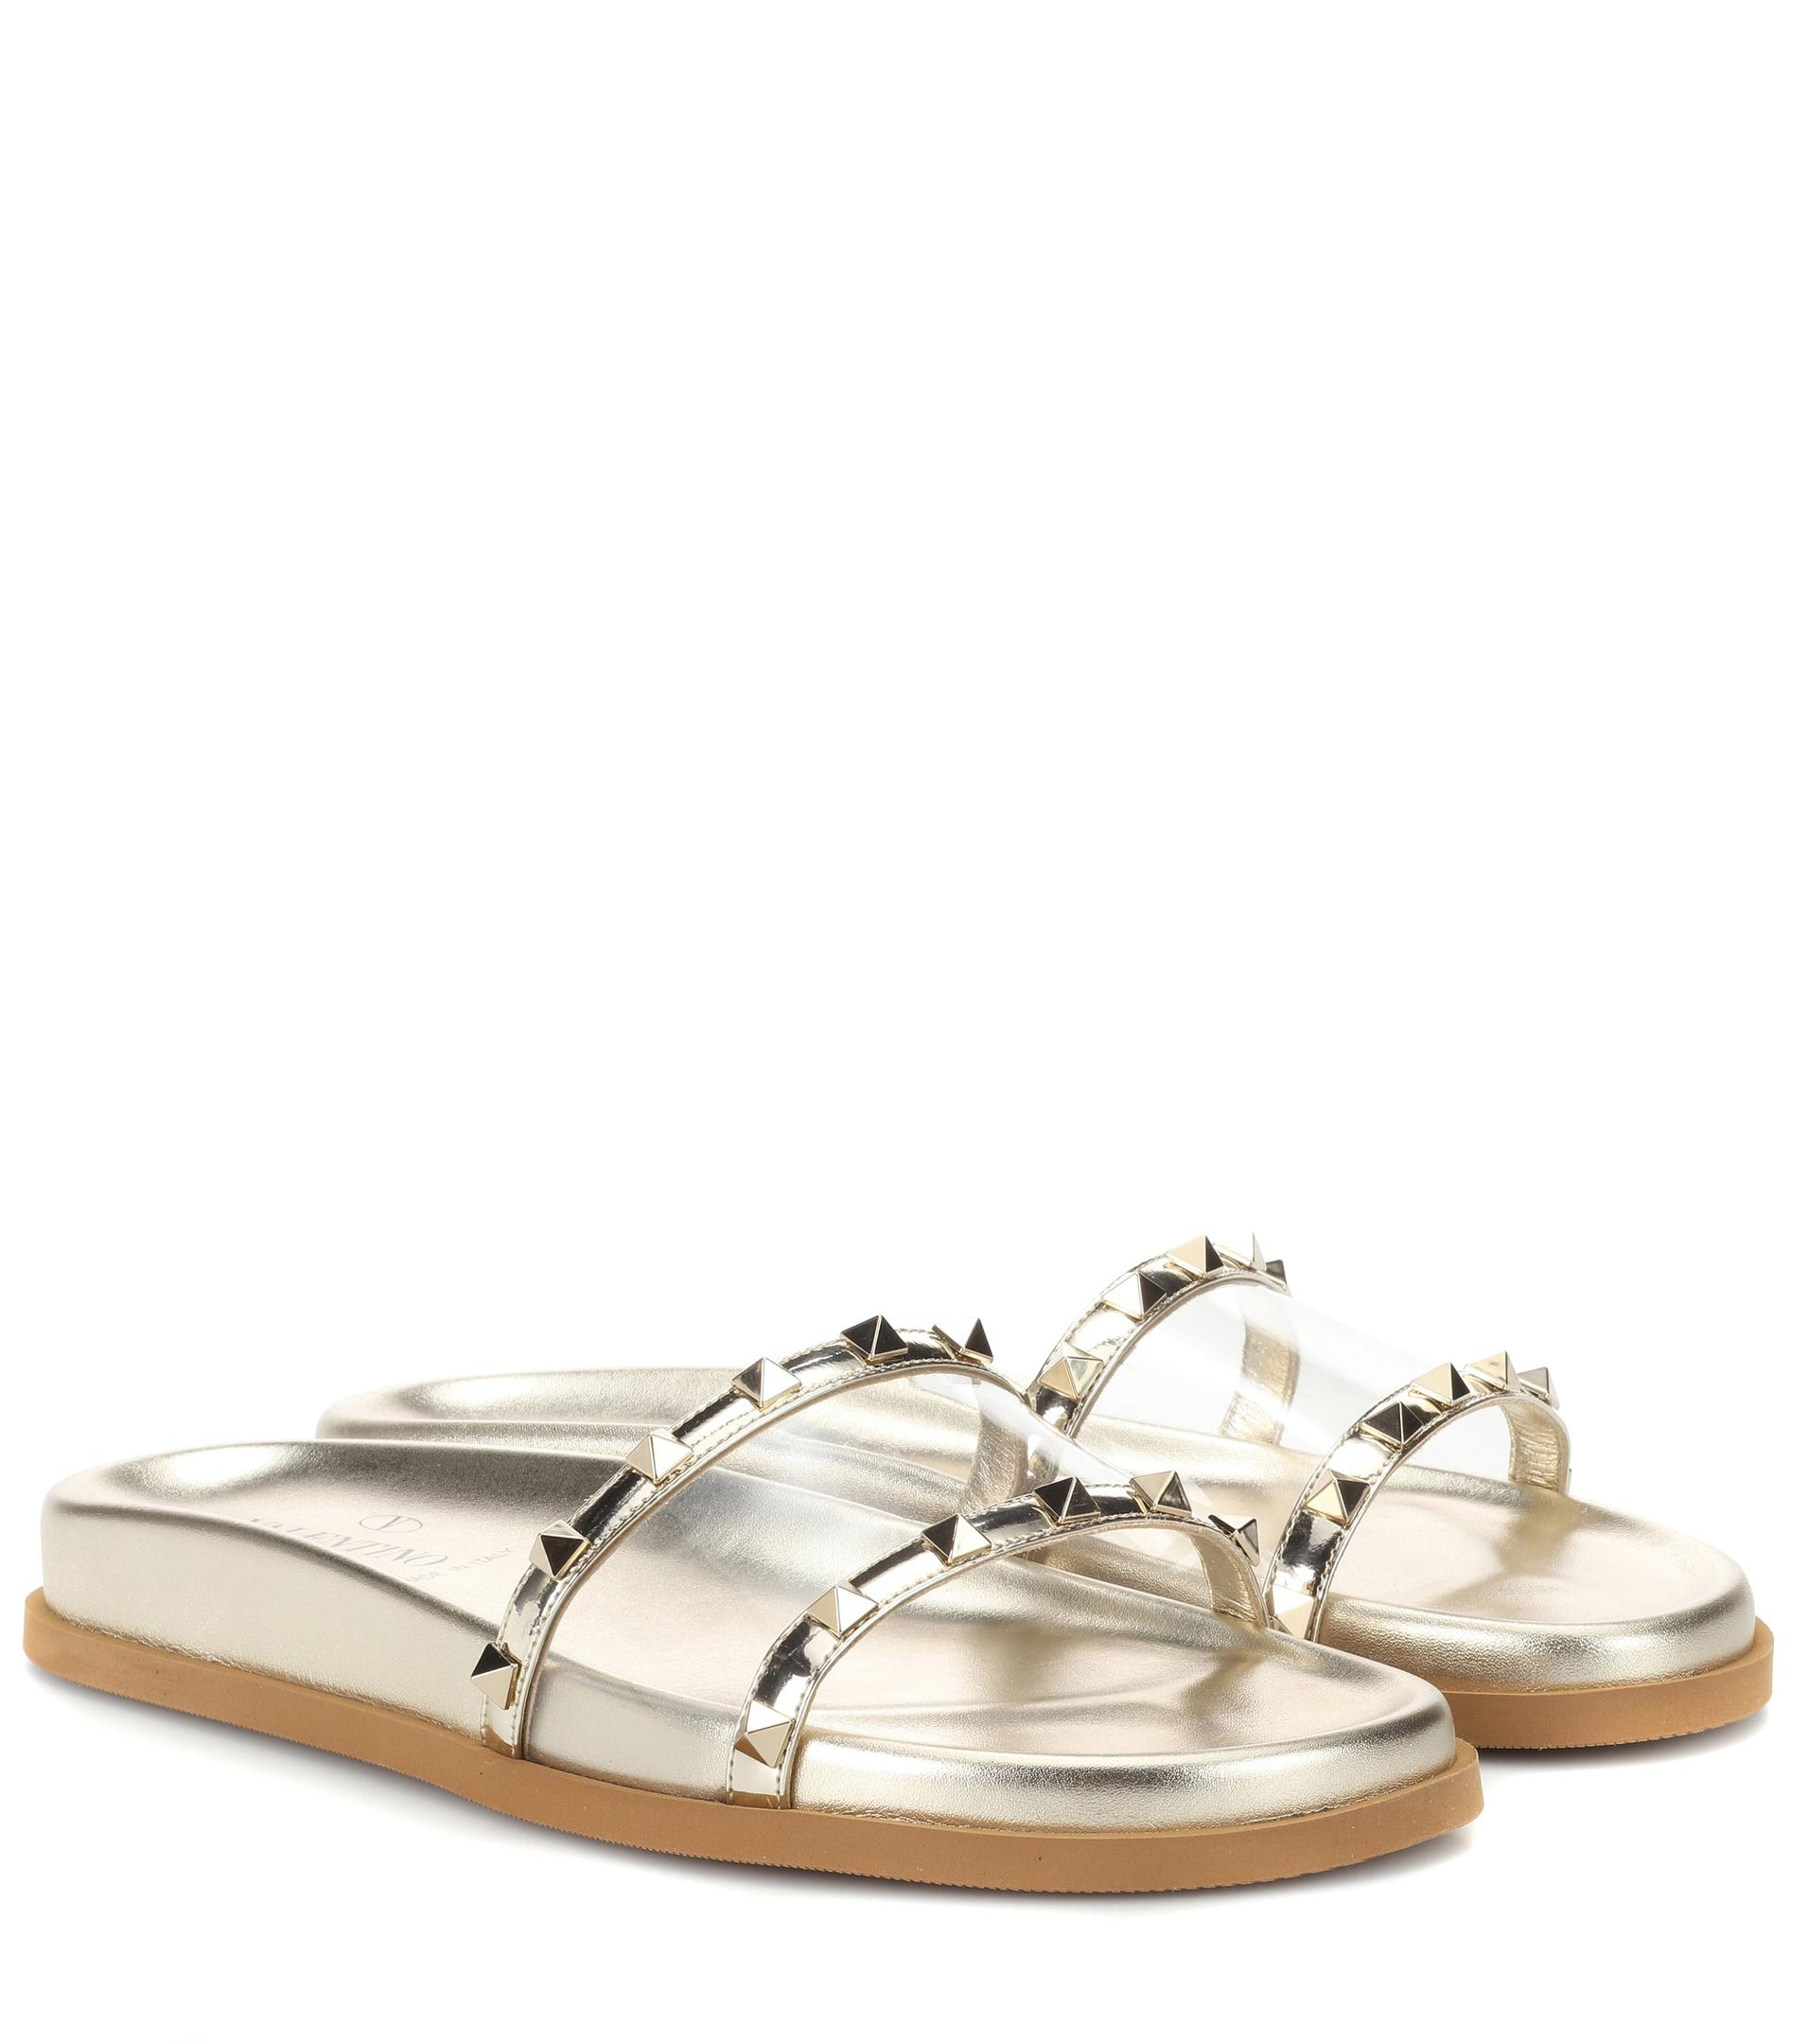 Valentino Valentino Garavani Moonwalk Rockstud sandals free shipping manchester great sale 9liaQSn18U